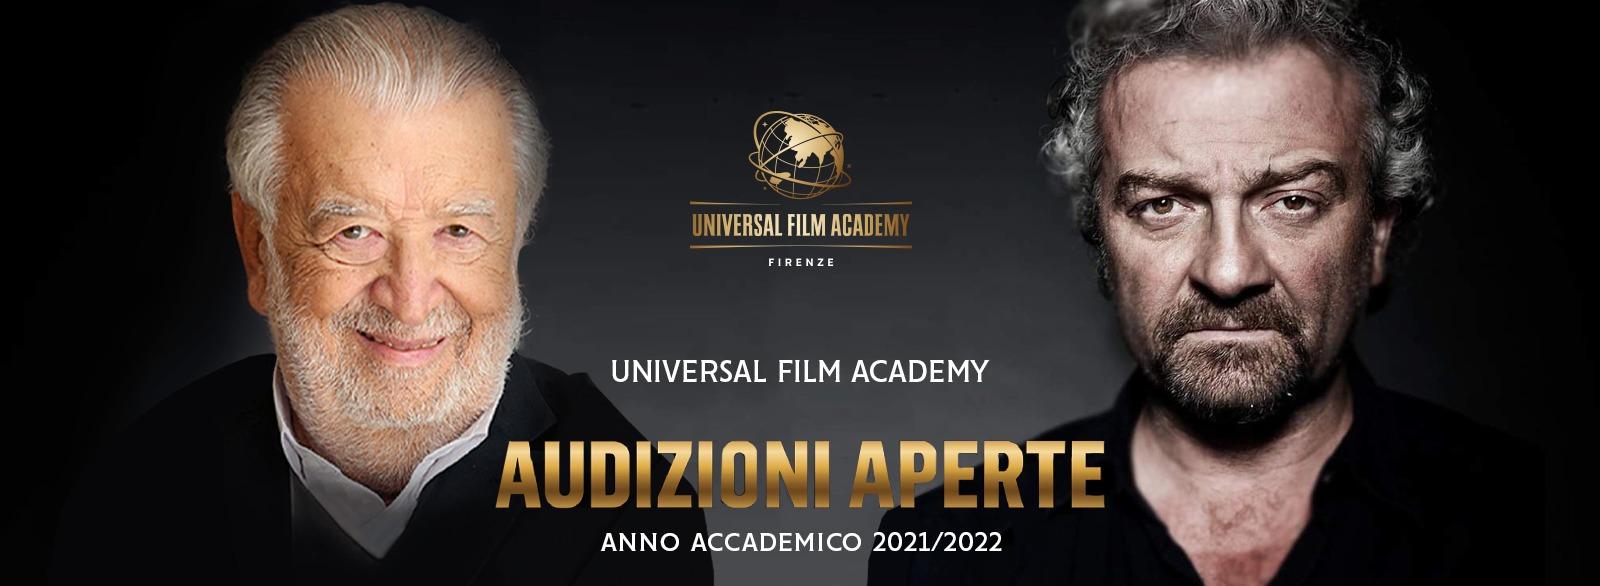 pupi-avati-giovanni veronesi-universal-film-academy